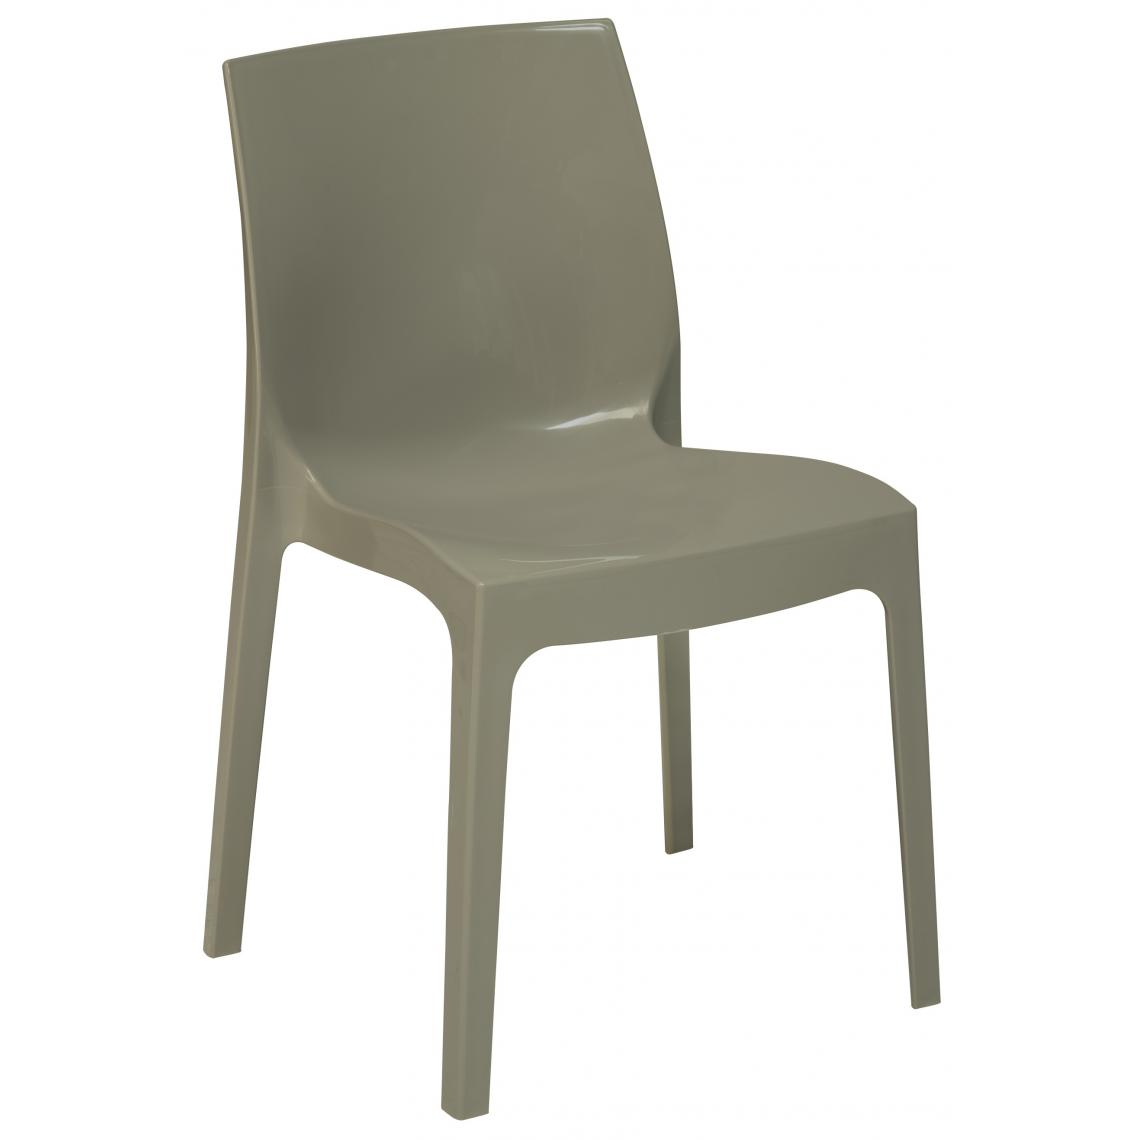 Chaise Design Grise Perle Laquee LADY 3Suisses Mobilier Deco